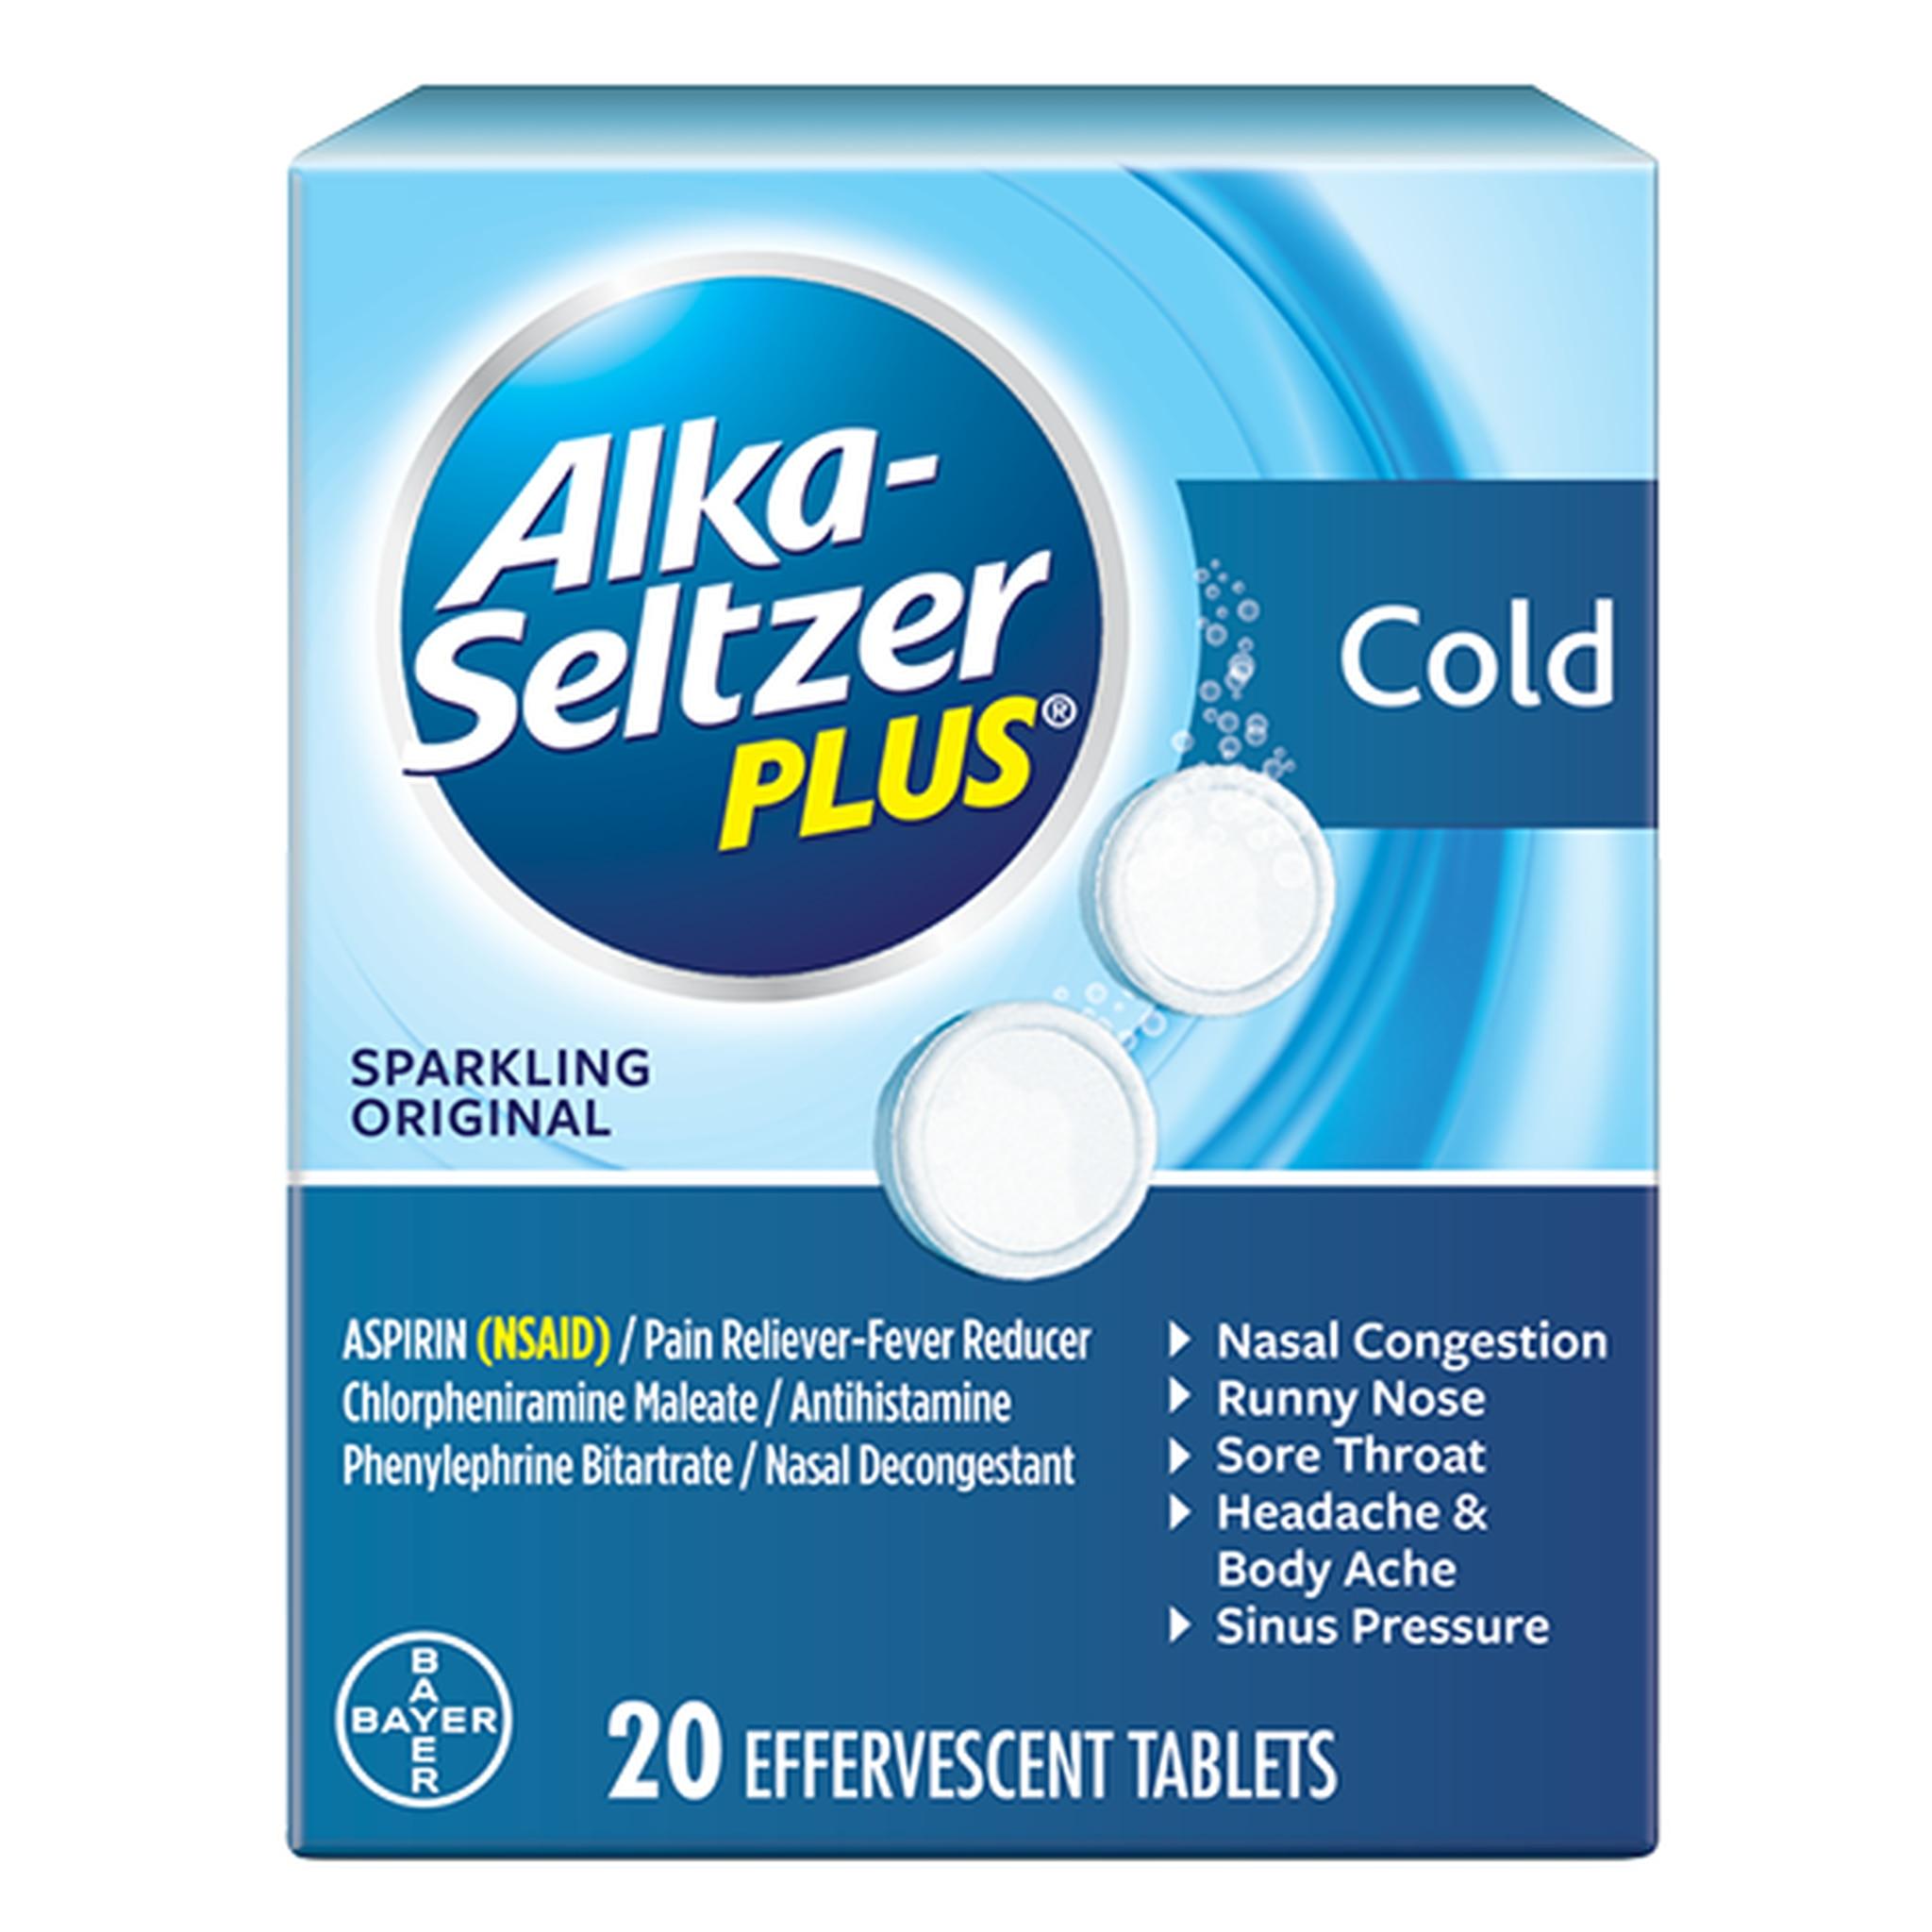 Alka-Seltzer Plus Cold Sparkling Original